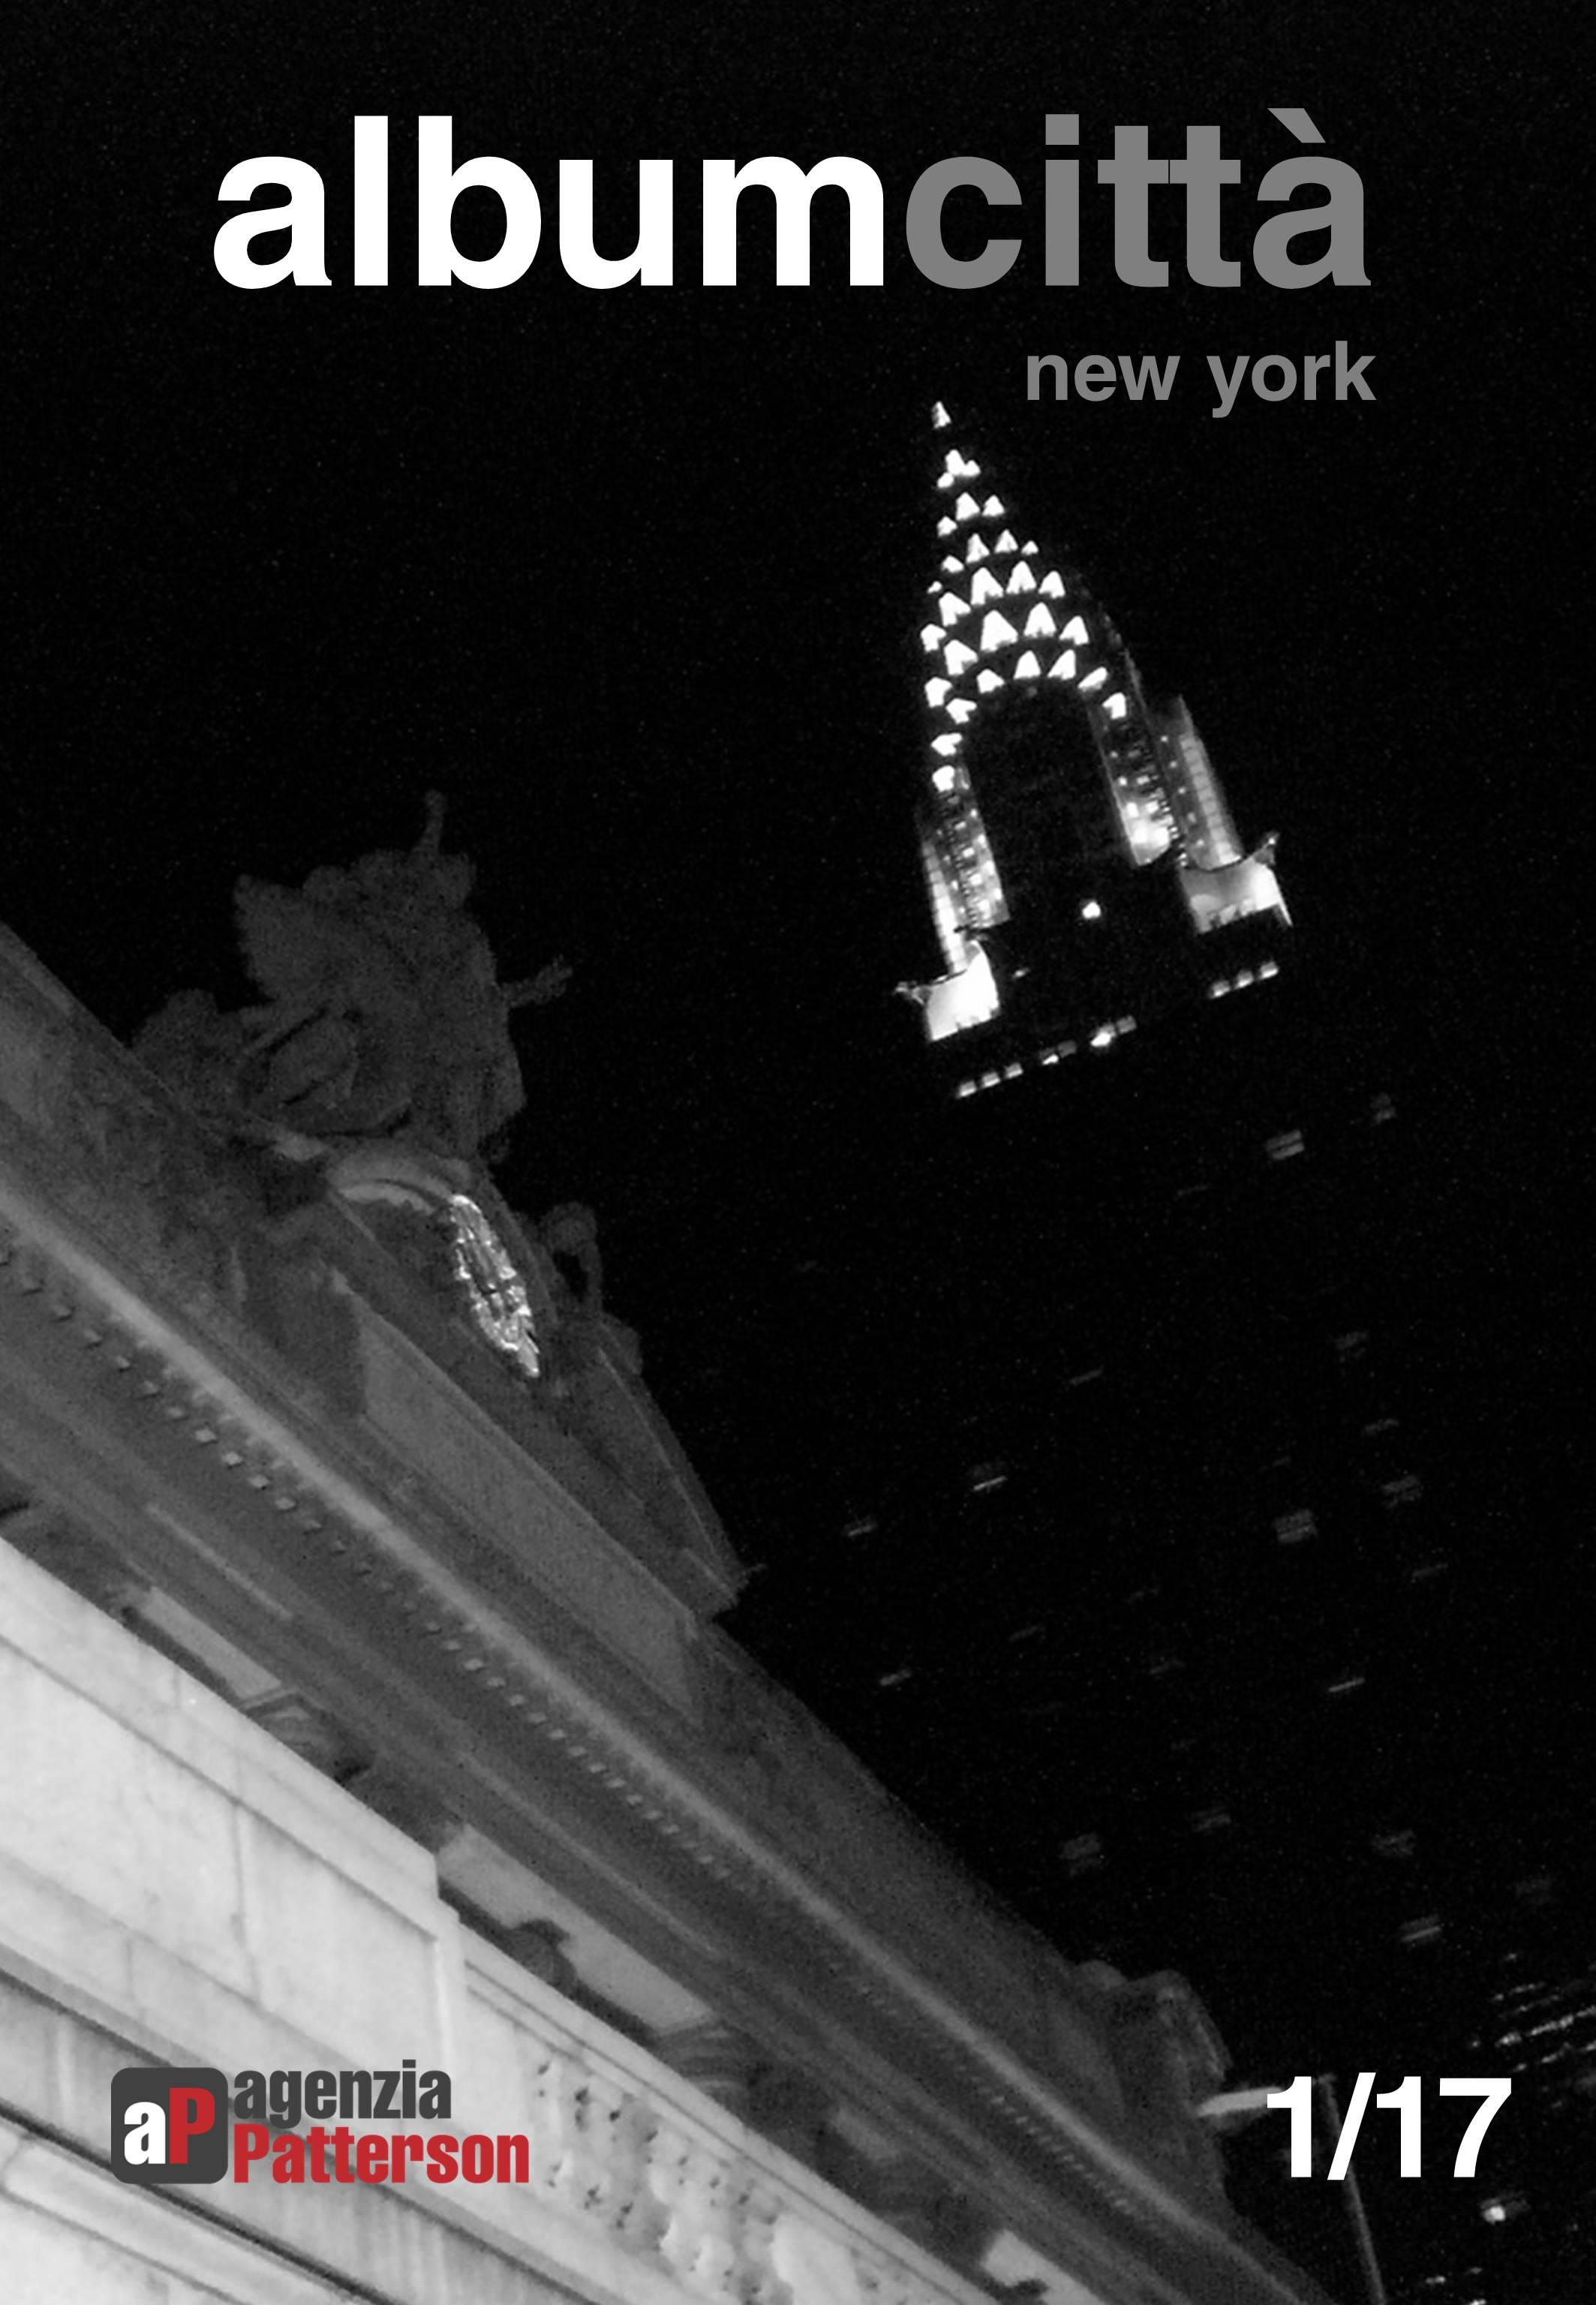 Albumcittà: New York